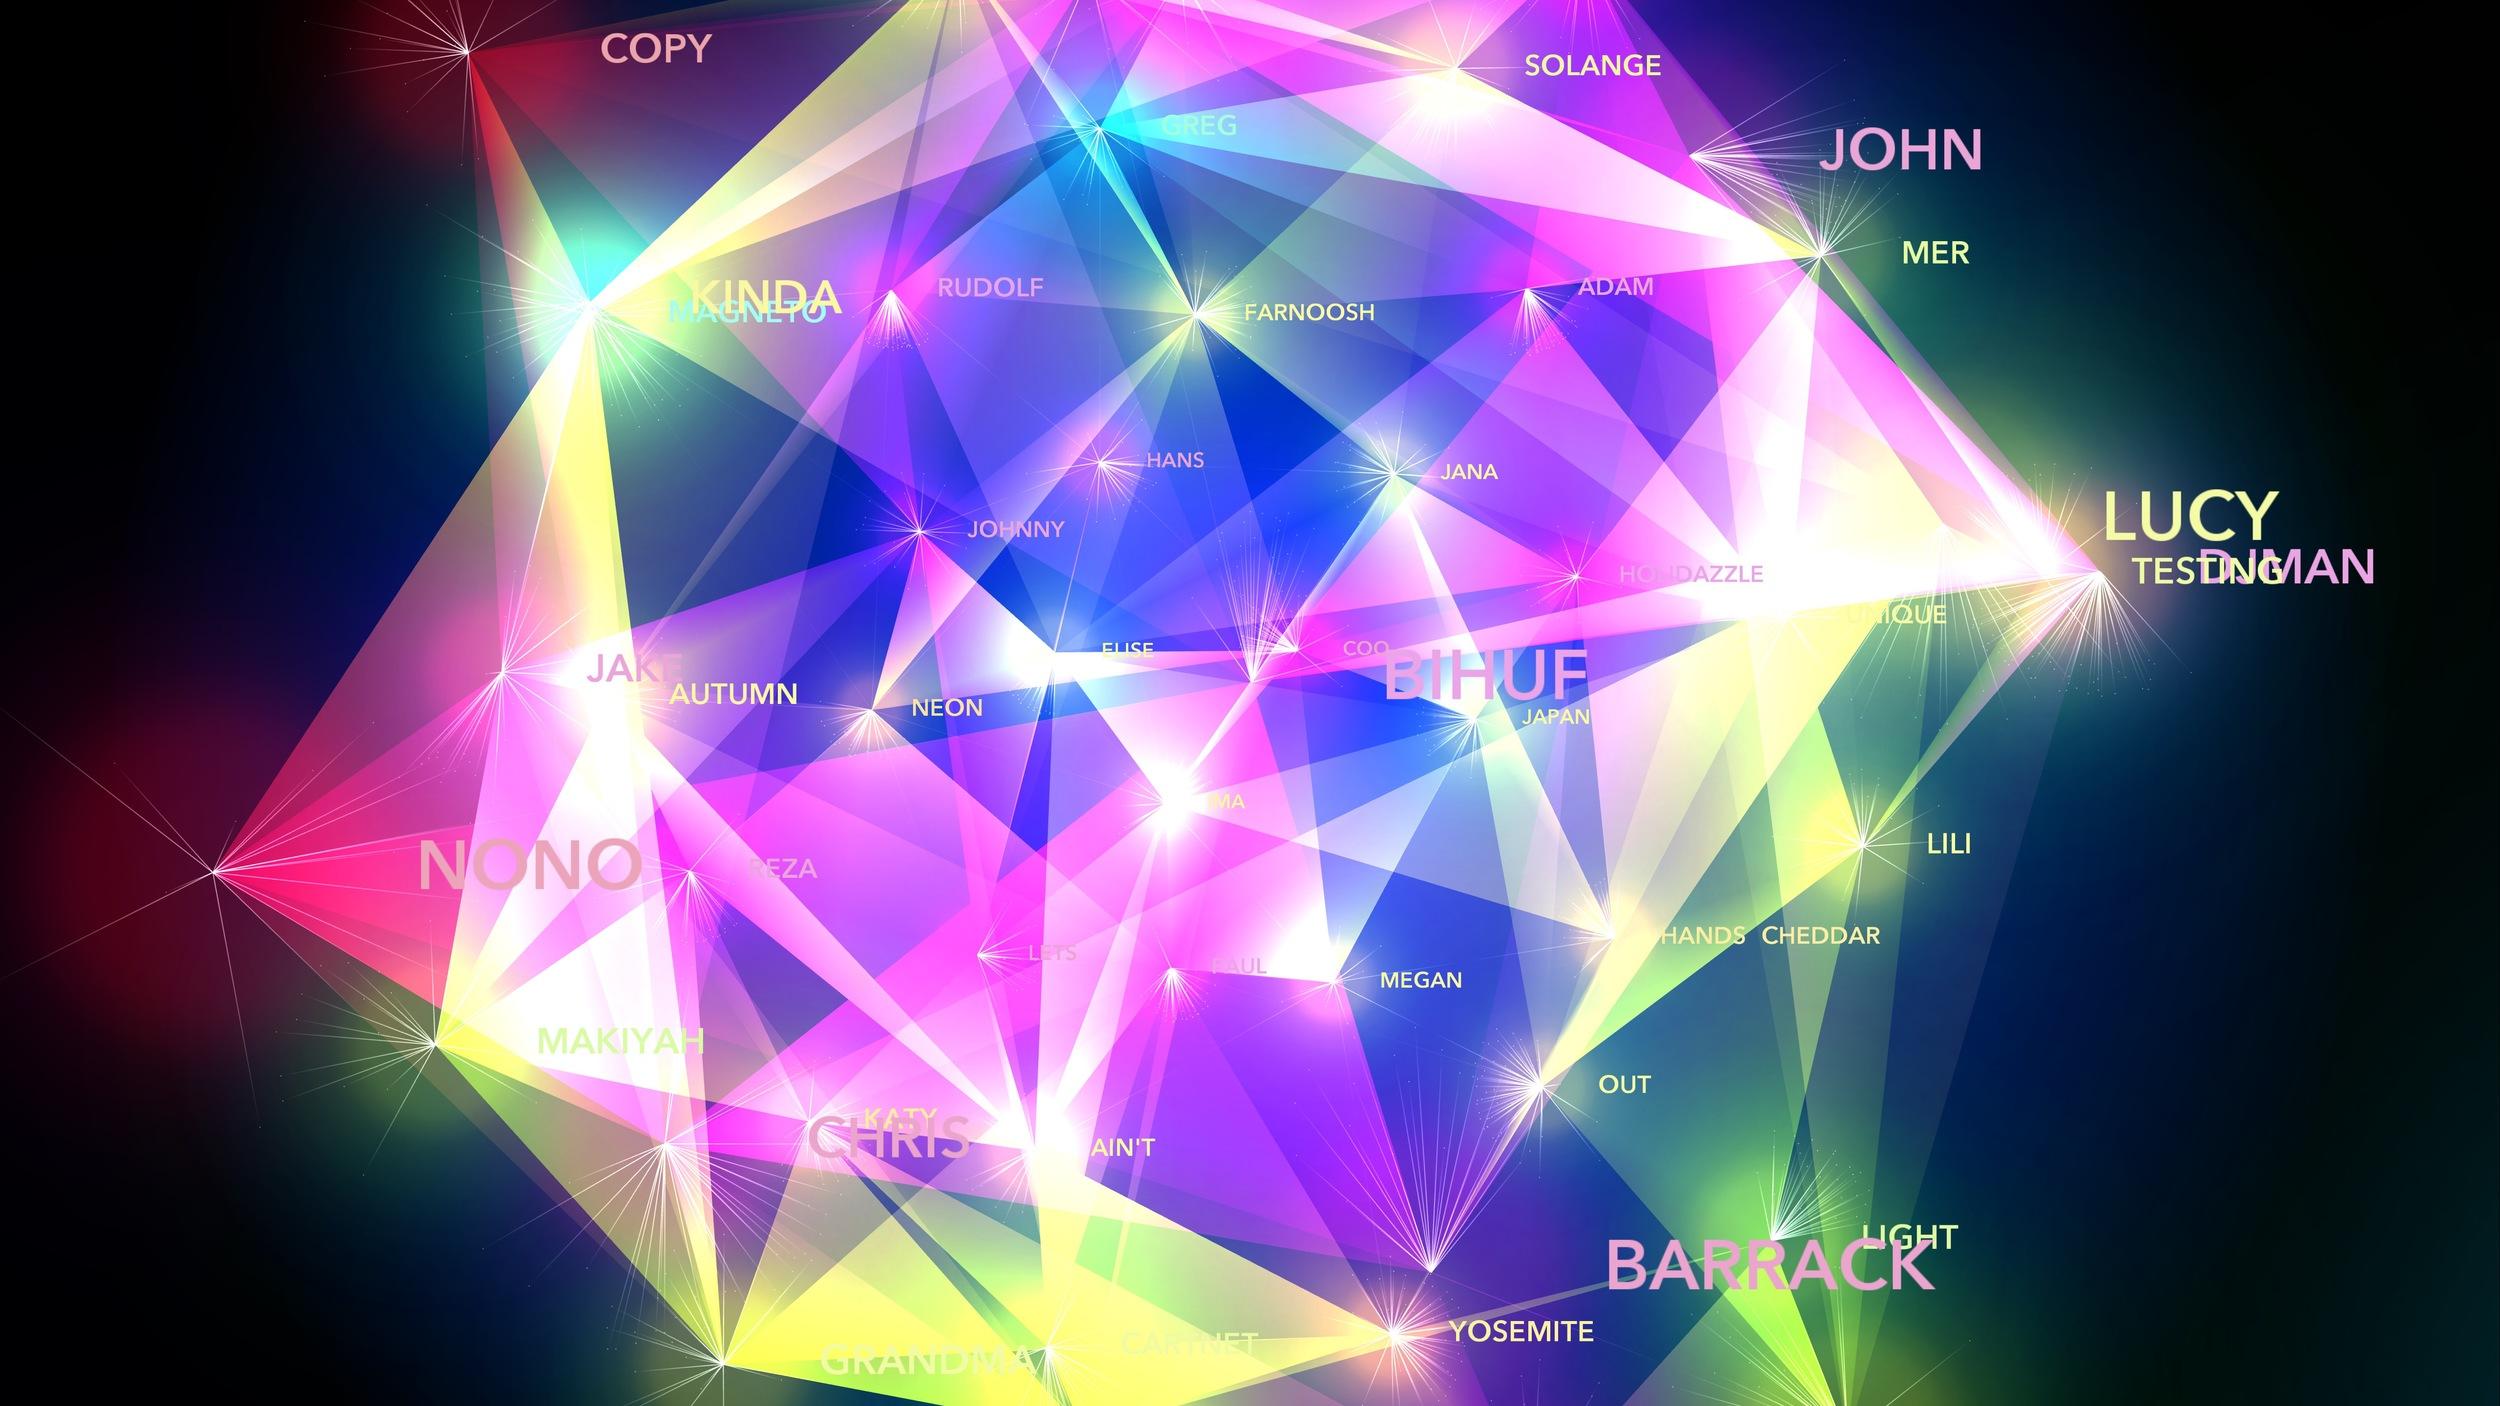 LightWaveLayer+2014-12-05-18-05-29-103_high+copy.jpg